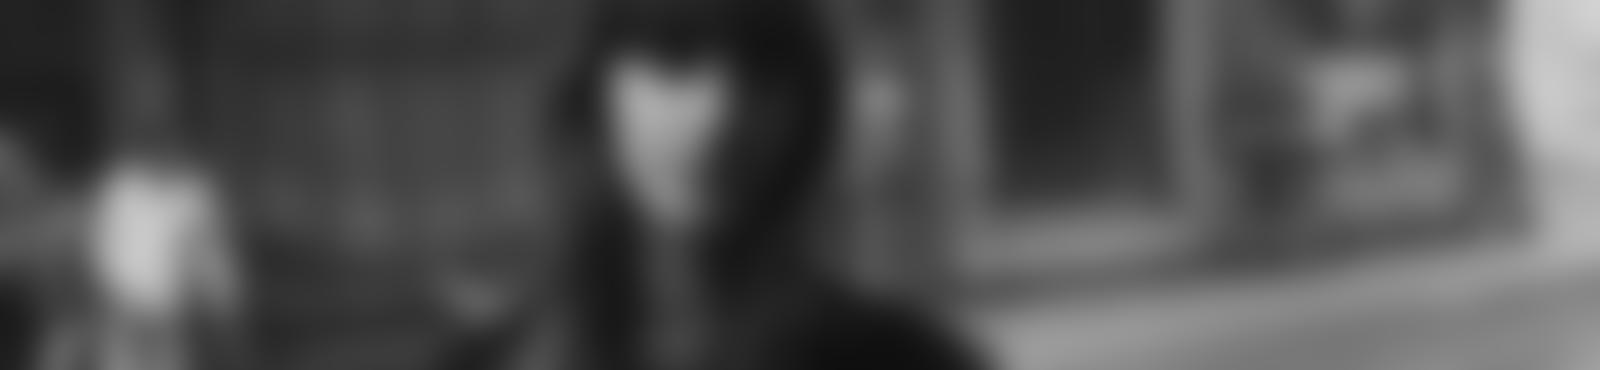 Blurred 46a1cdae 38fe 41b1 bb8f 4f42dffb52c5